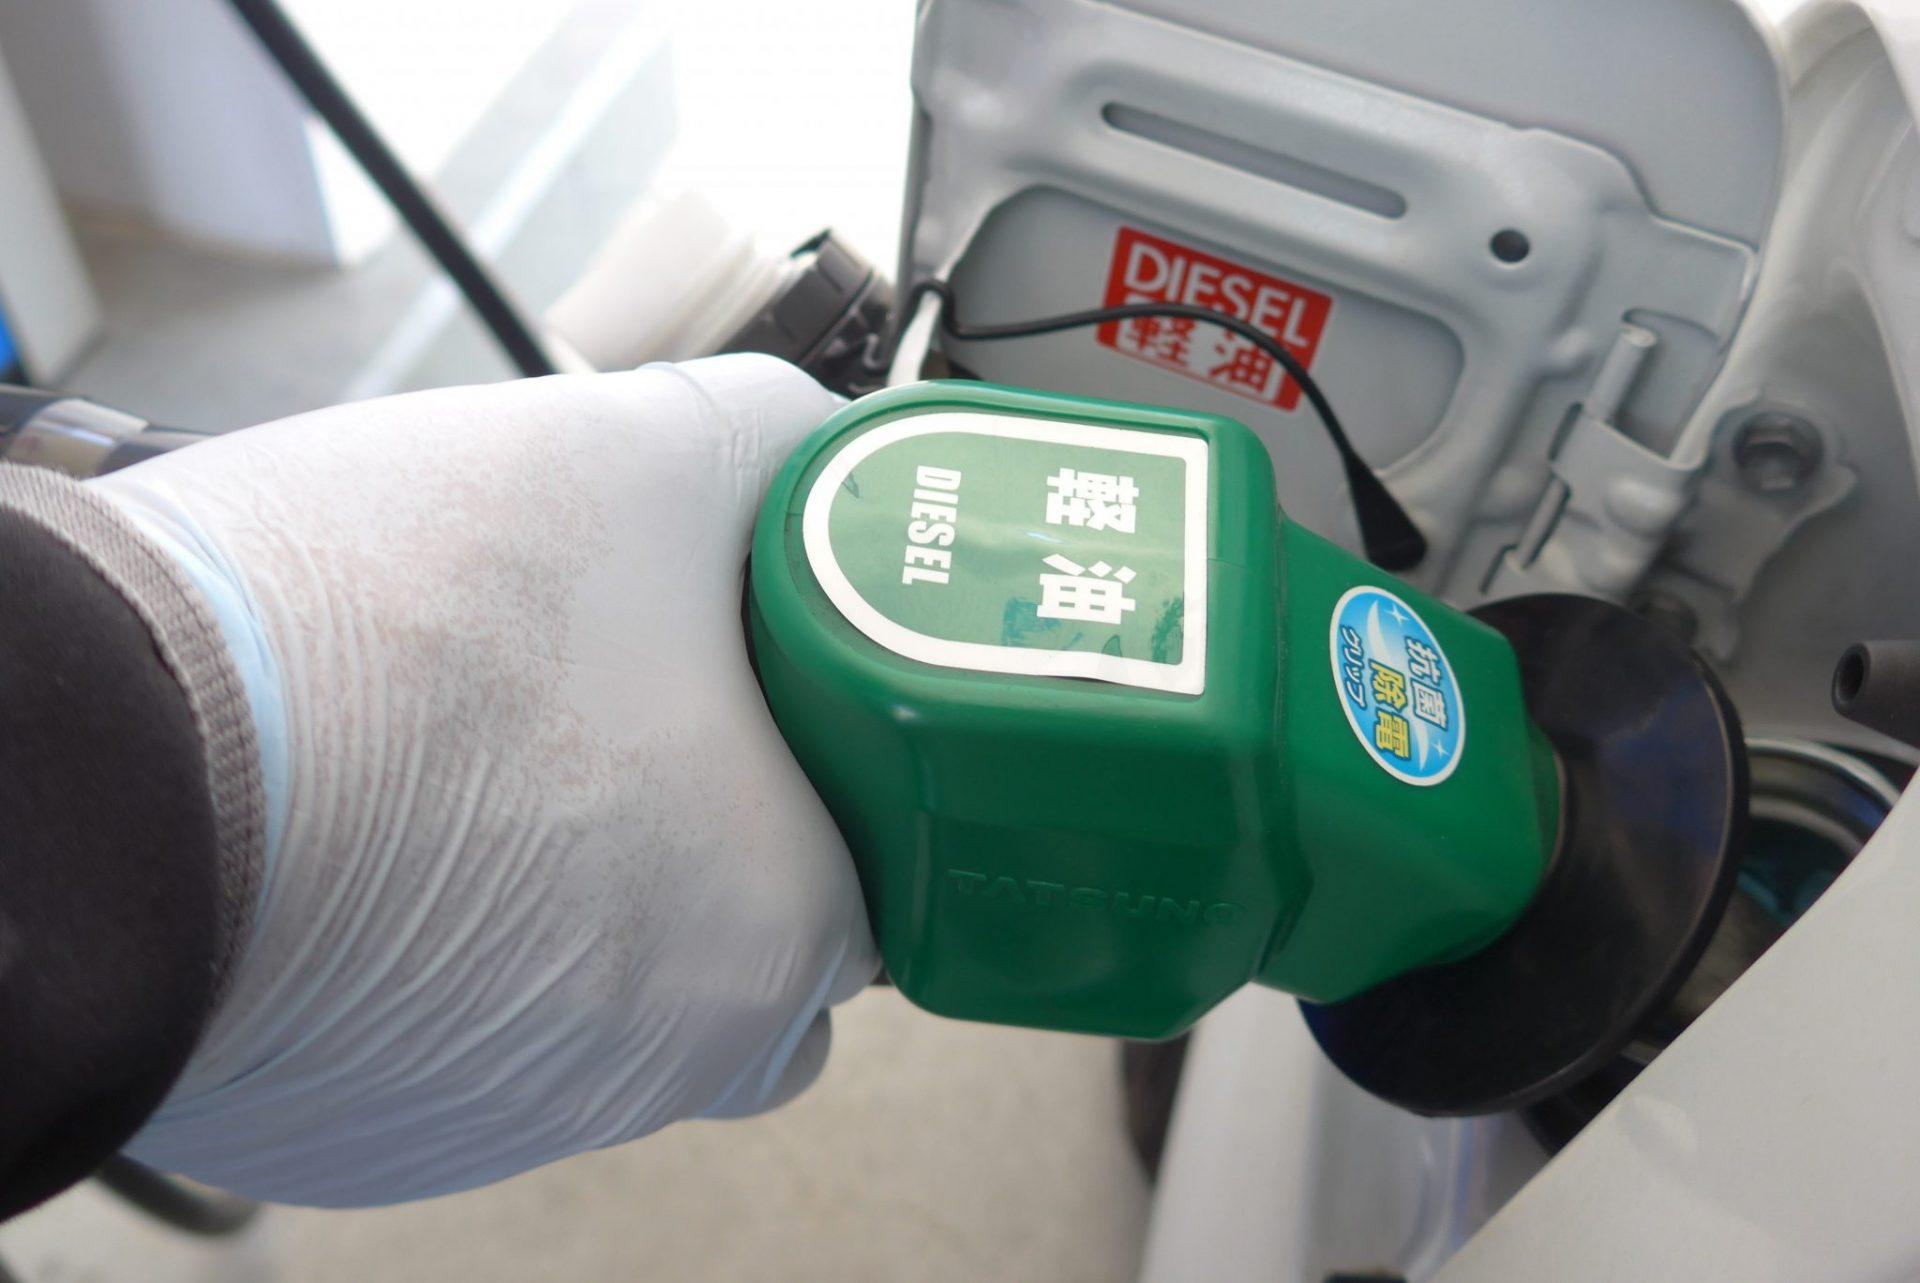 (K)新型コロナウイルス感染予防に使い捨て手袋!セルフスタンドで